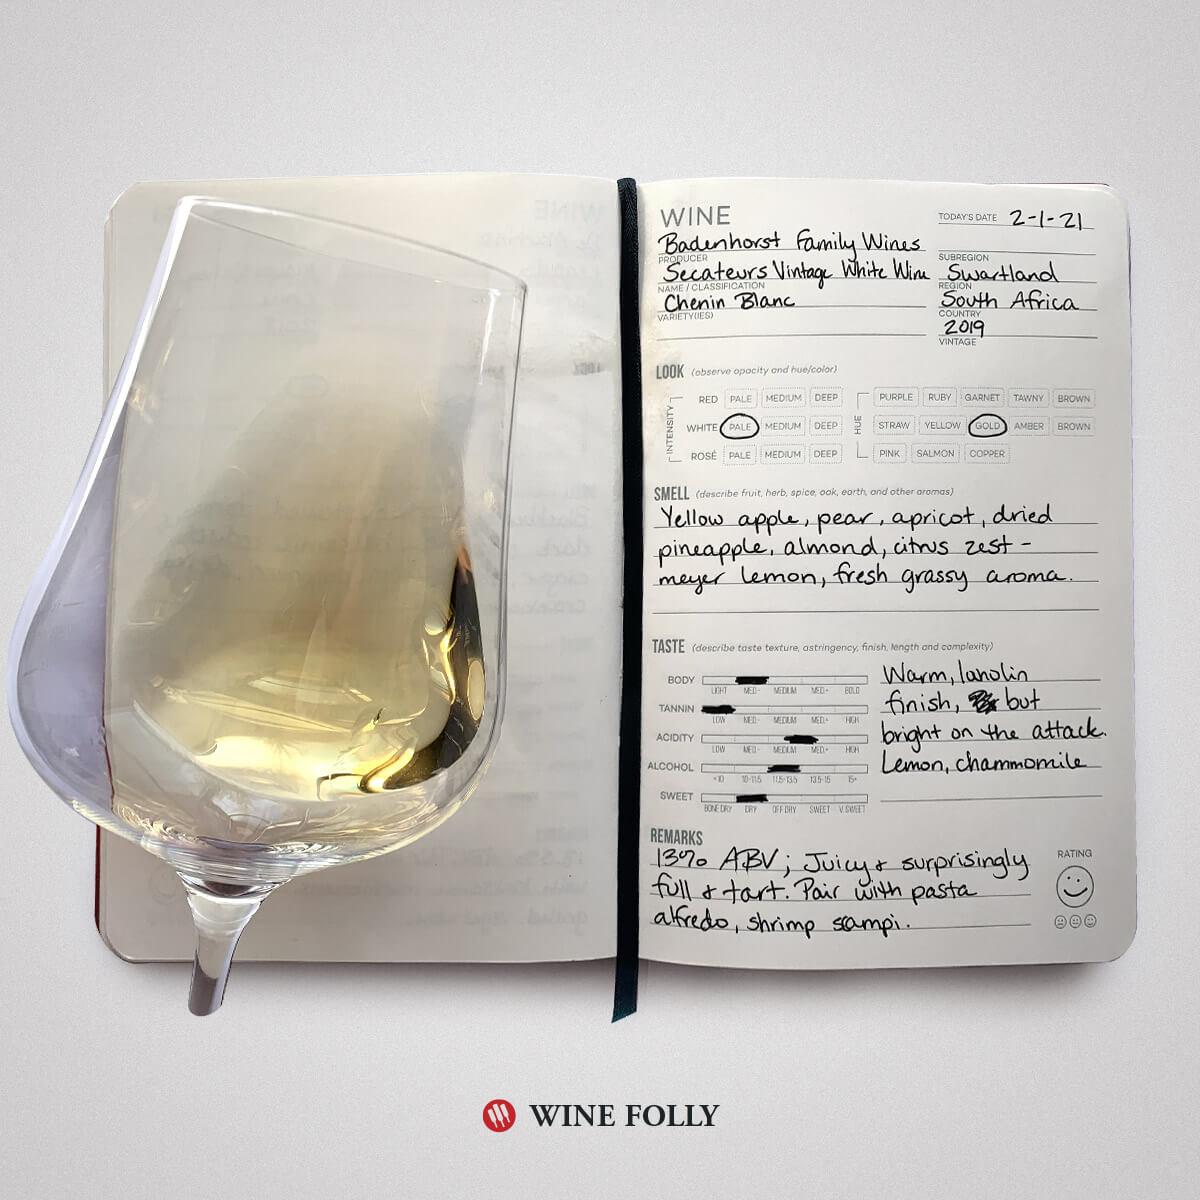 chenin-blanc-wine-tasting-notes-journal